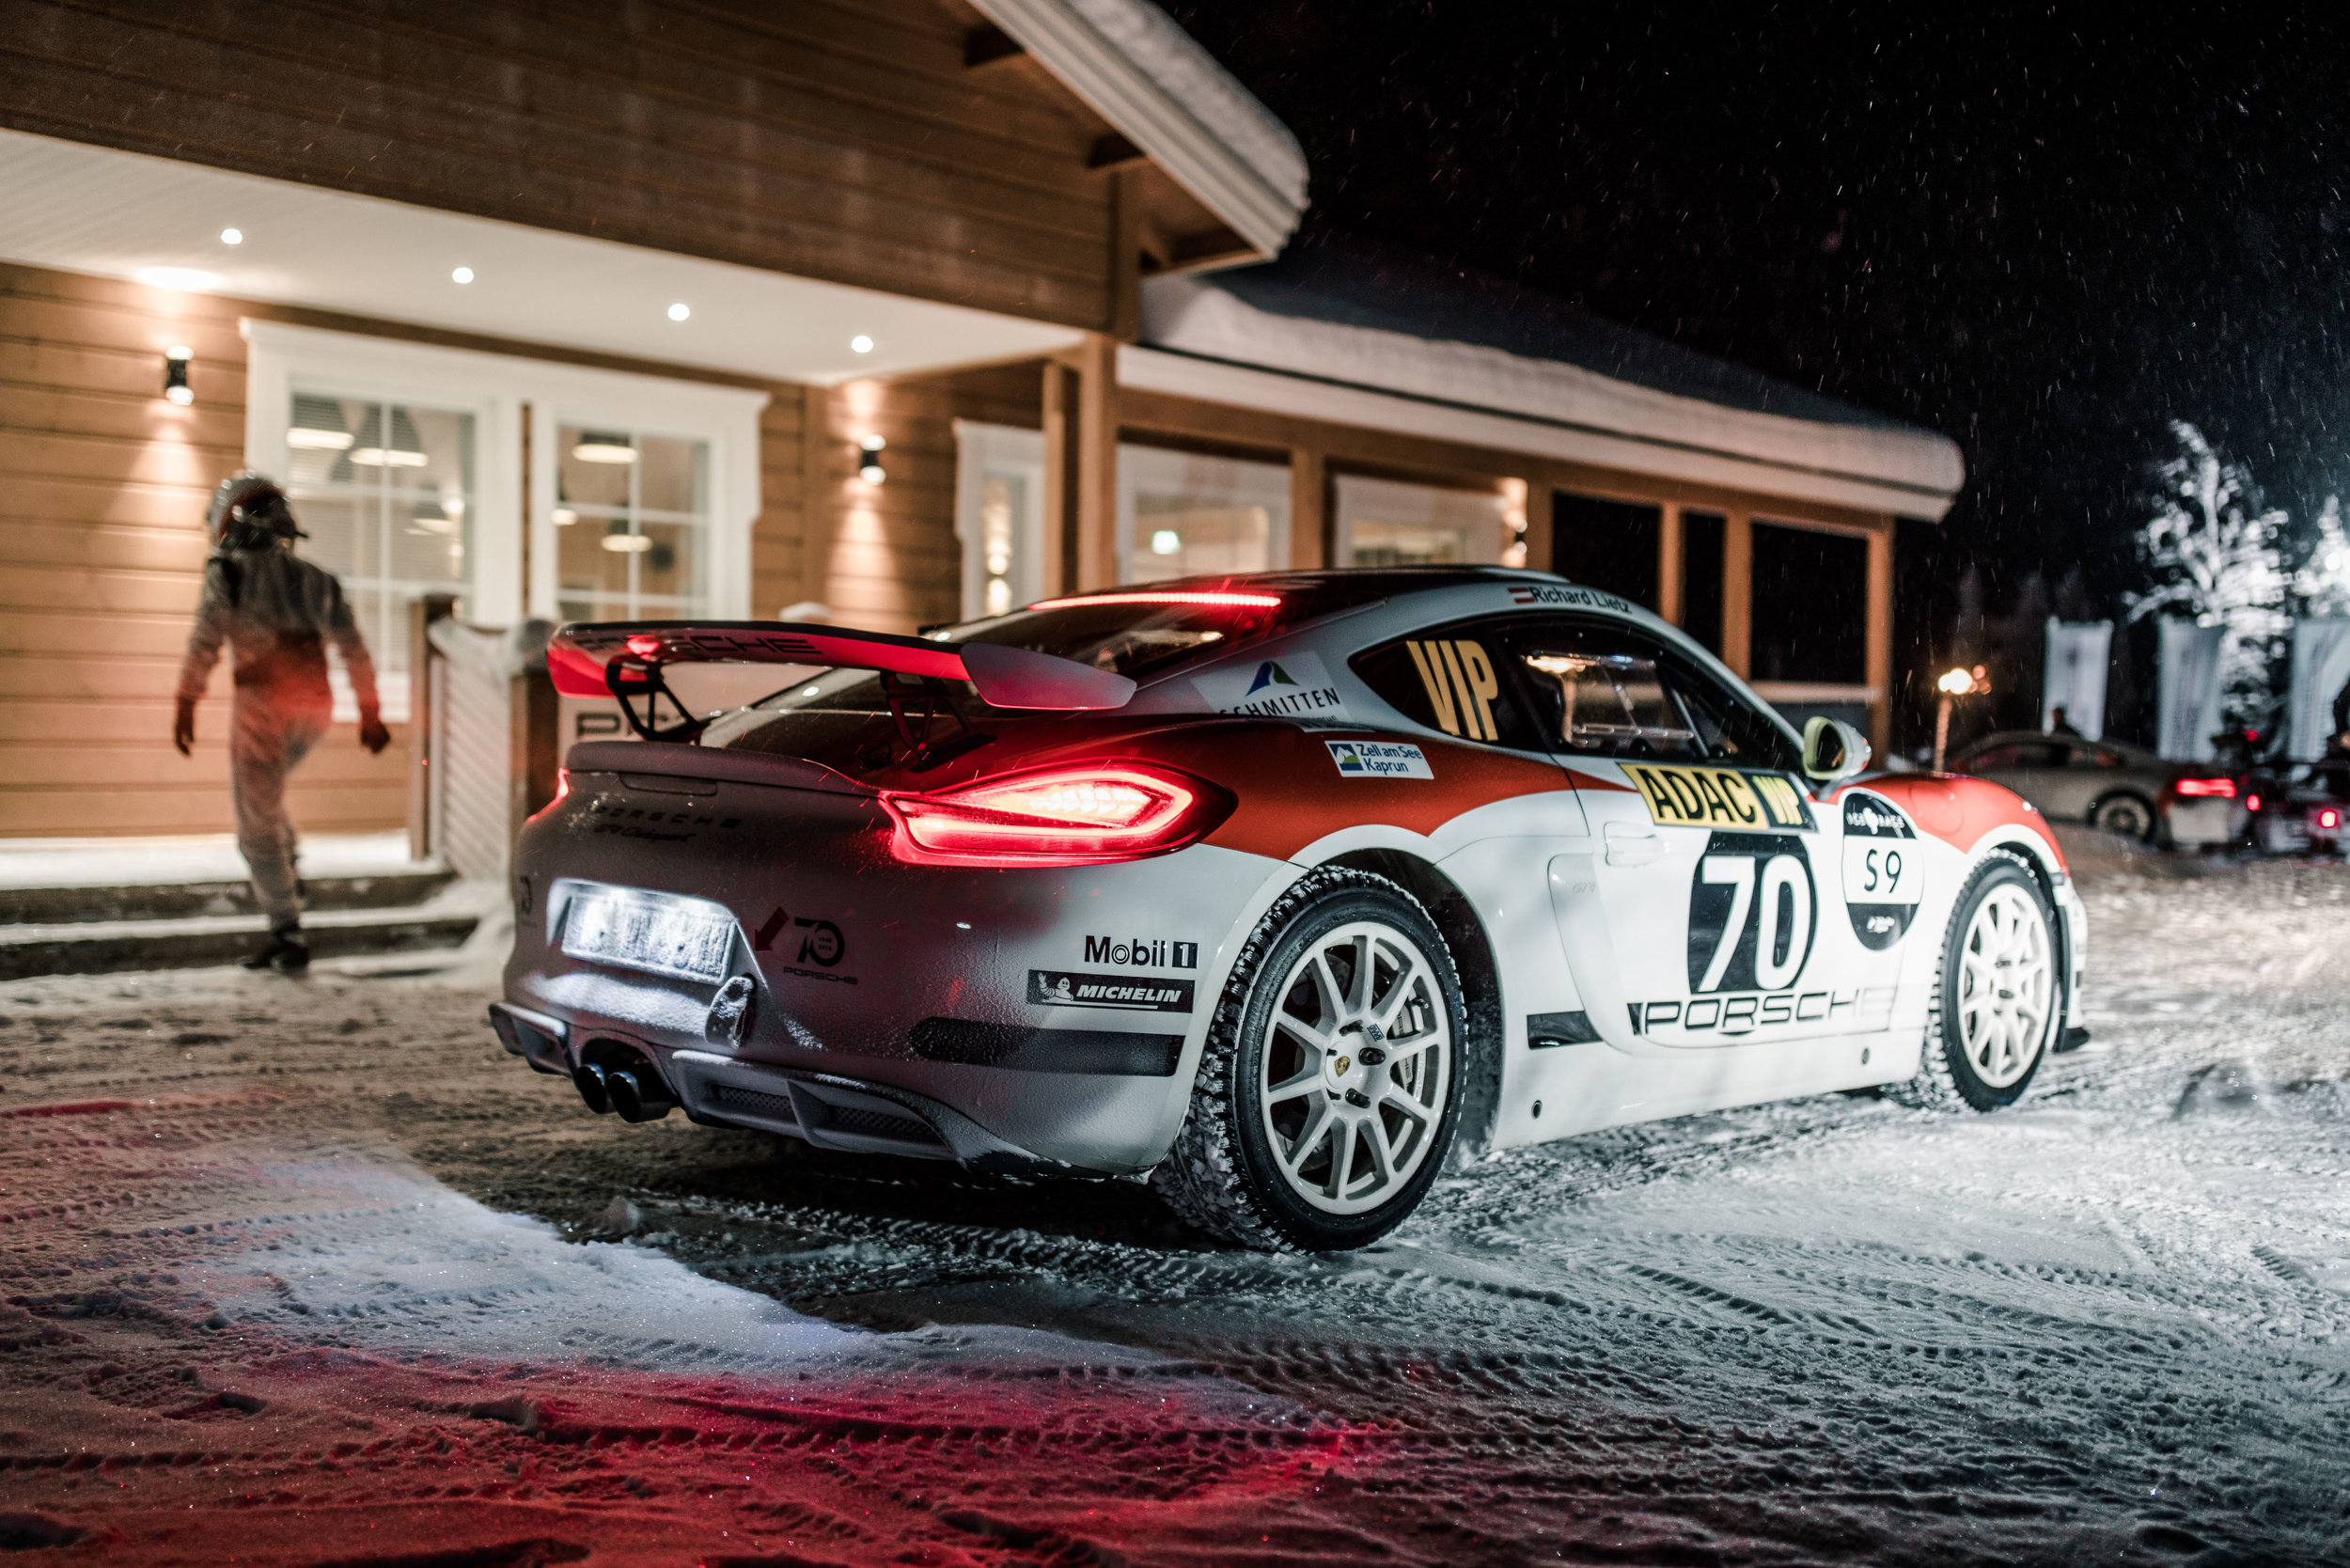 Porsche Ice Experience on Ice_30_01_2019_0584_175703.jpg